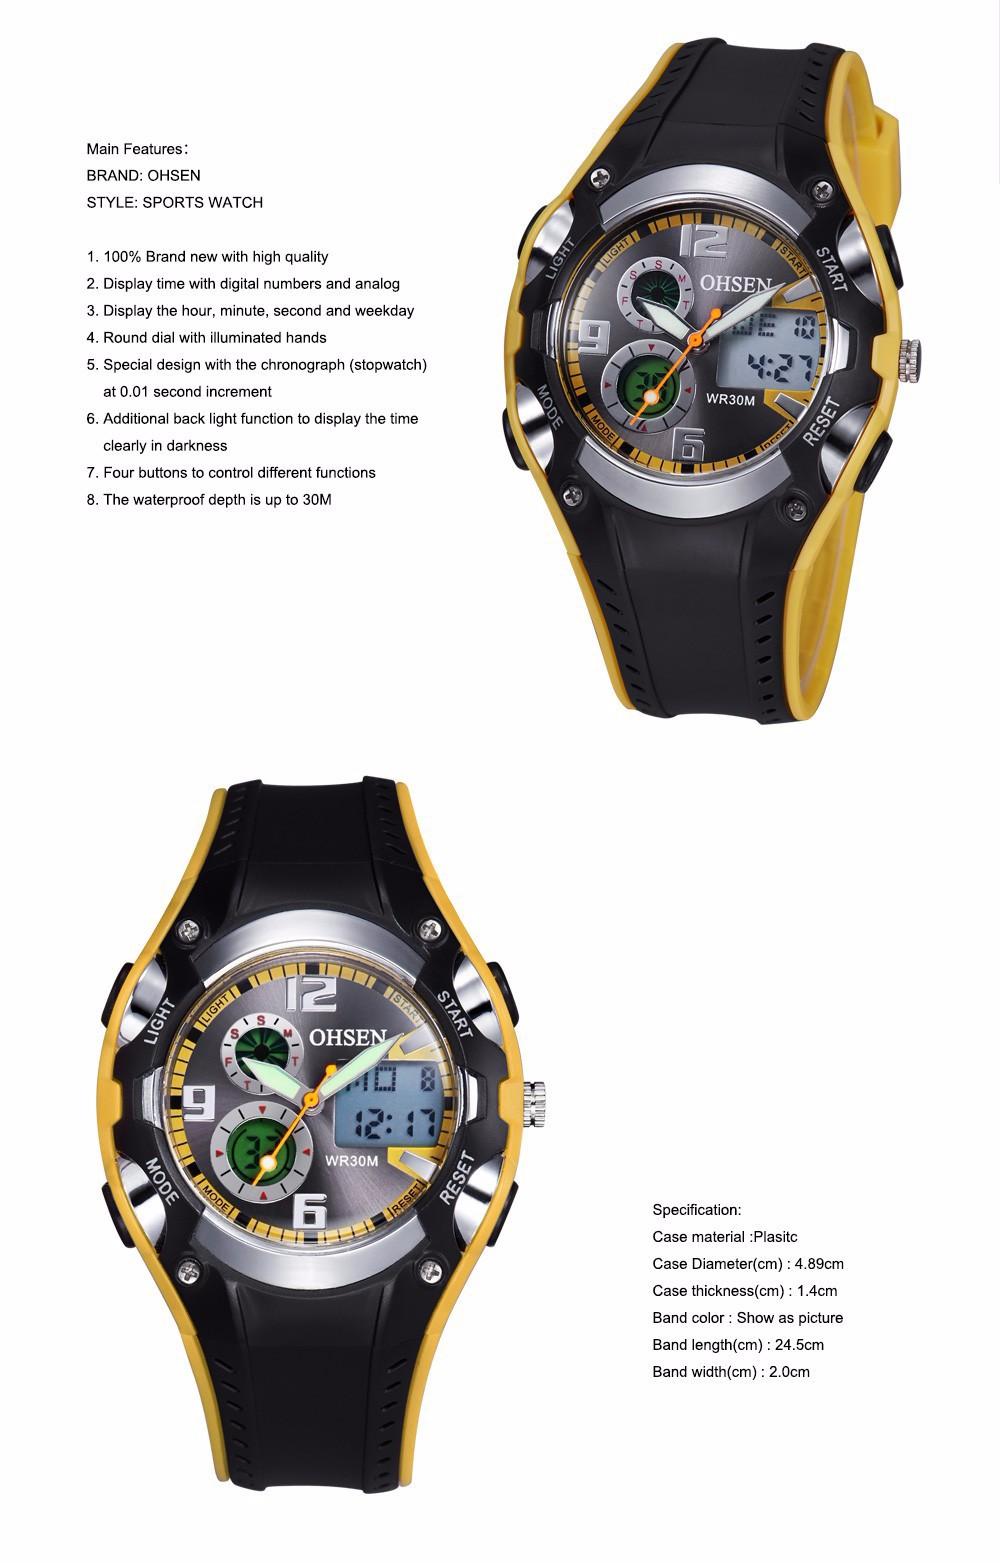 Original Ohsen Brand Fashion Sports Men's Watches 30M Waterproof Rubber Black Rubber Band Digital Sport Wristwatch for Men Gift (15)